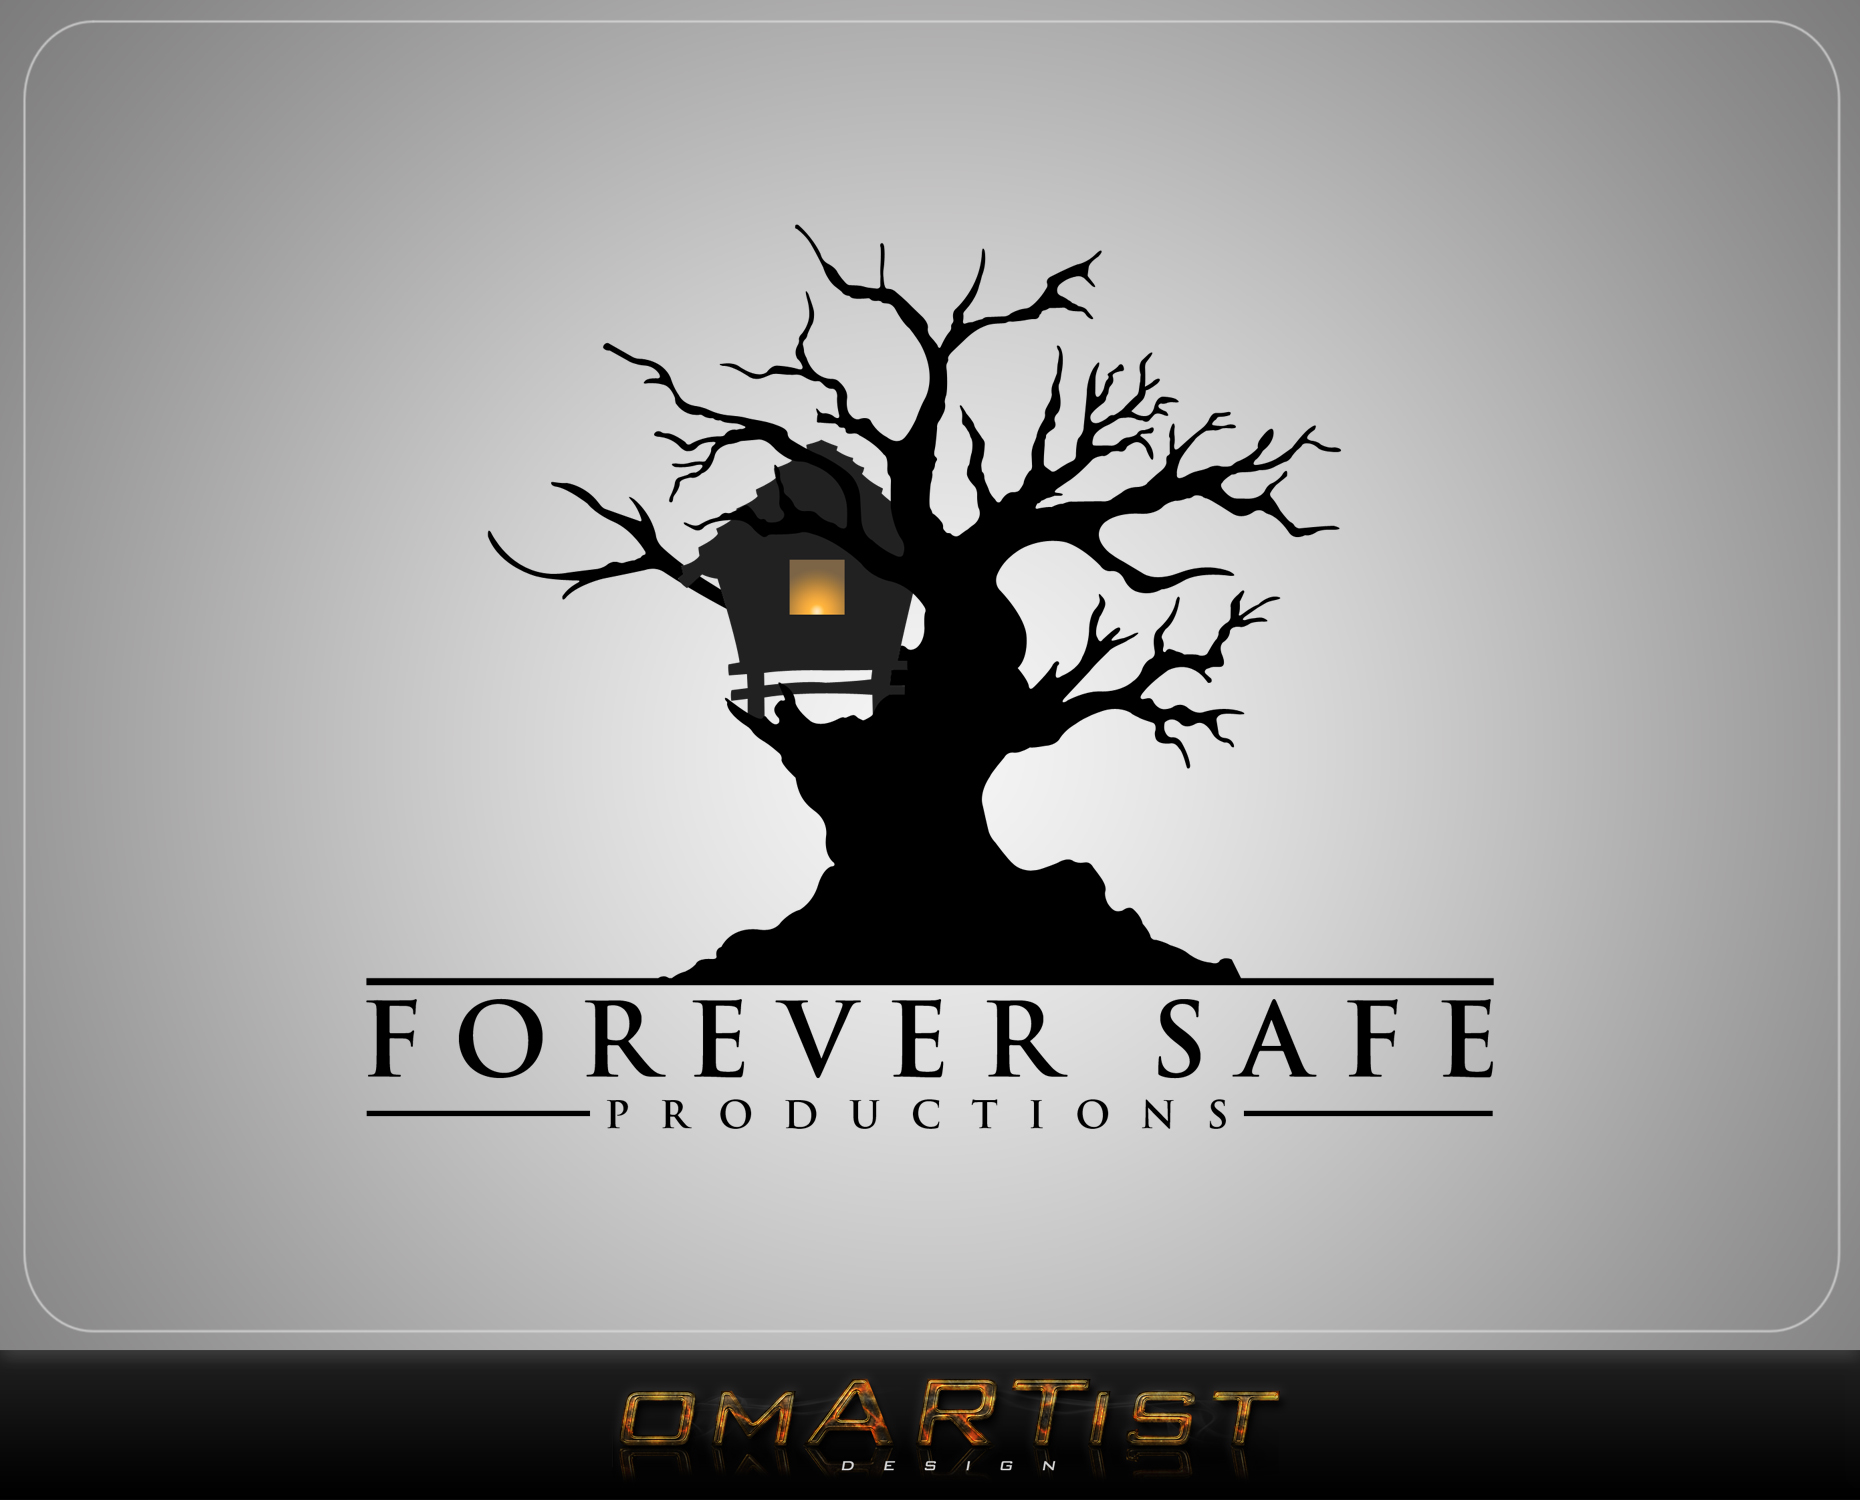 Logo Design by omARTist - Entry No. 20 in the Logo Design Contest Inspiring Logo Design for Forever Safe Productions.